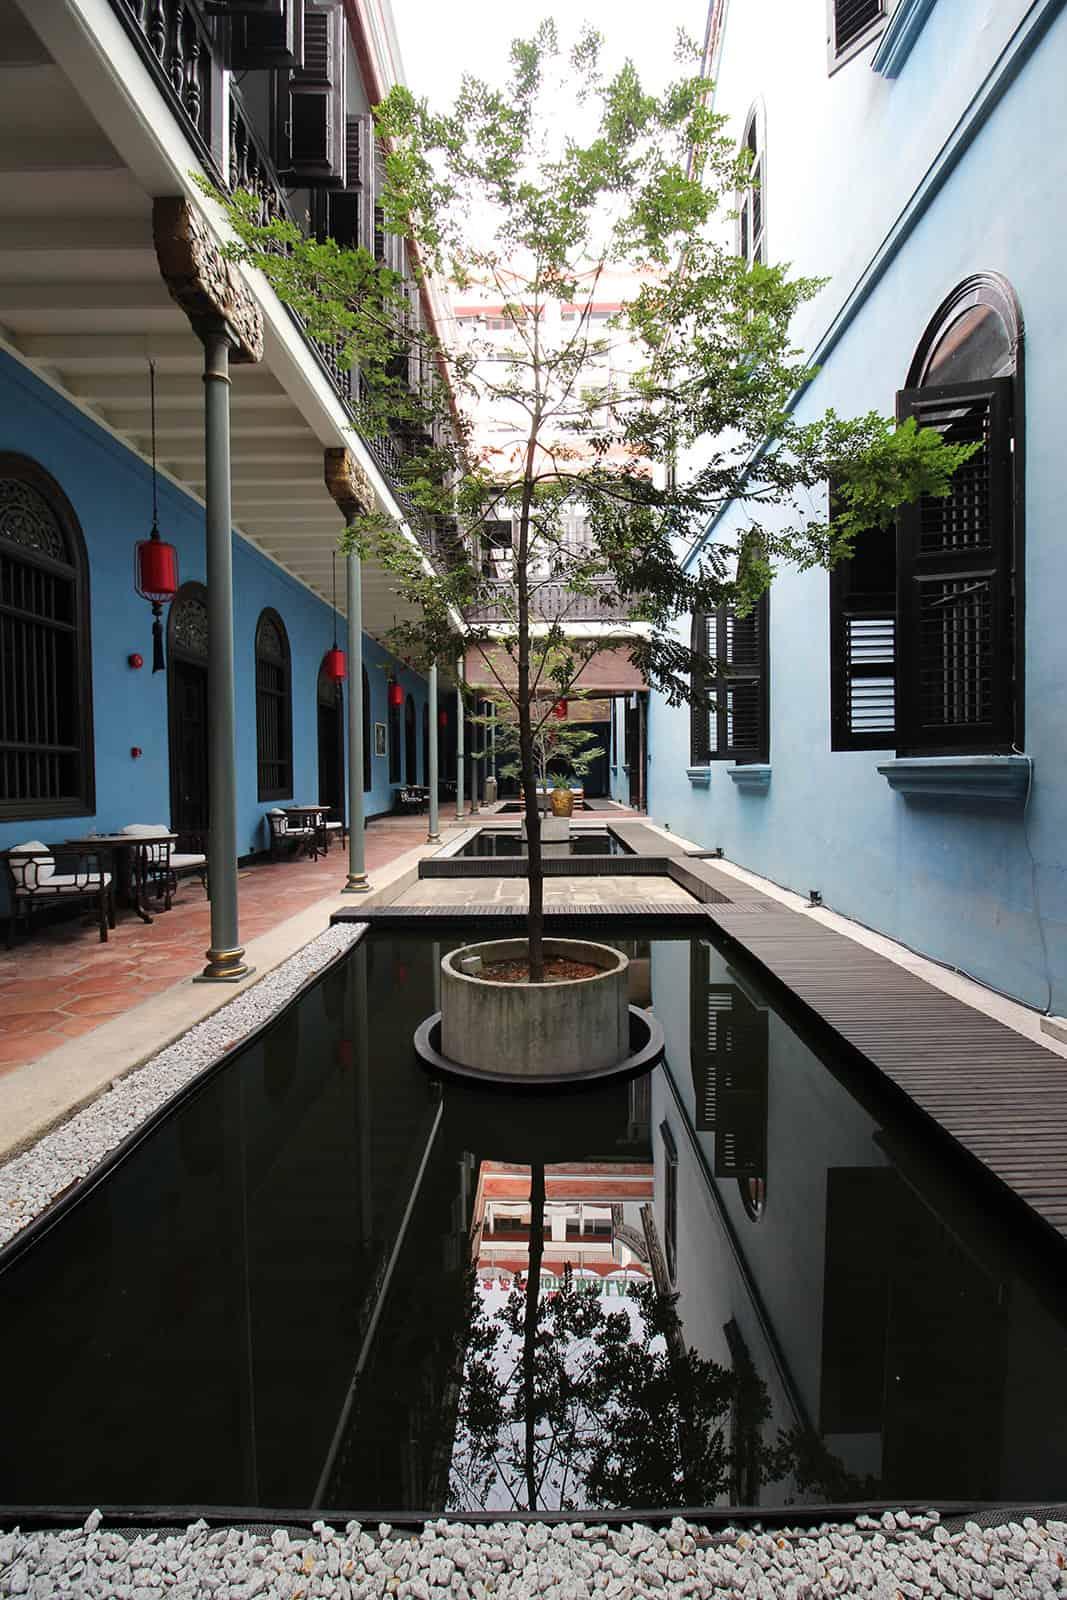 boutique-hotel-penang-island-blue-mansion-architecture-01-1_uqsubw Architecture